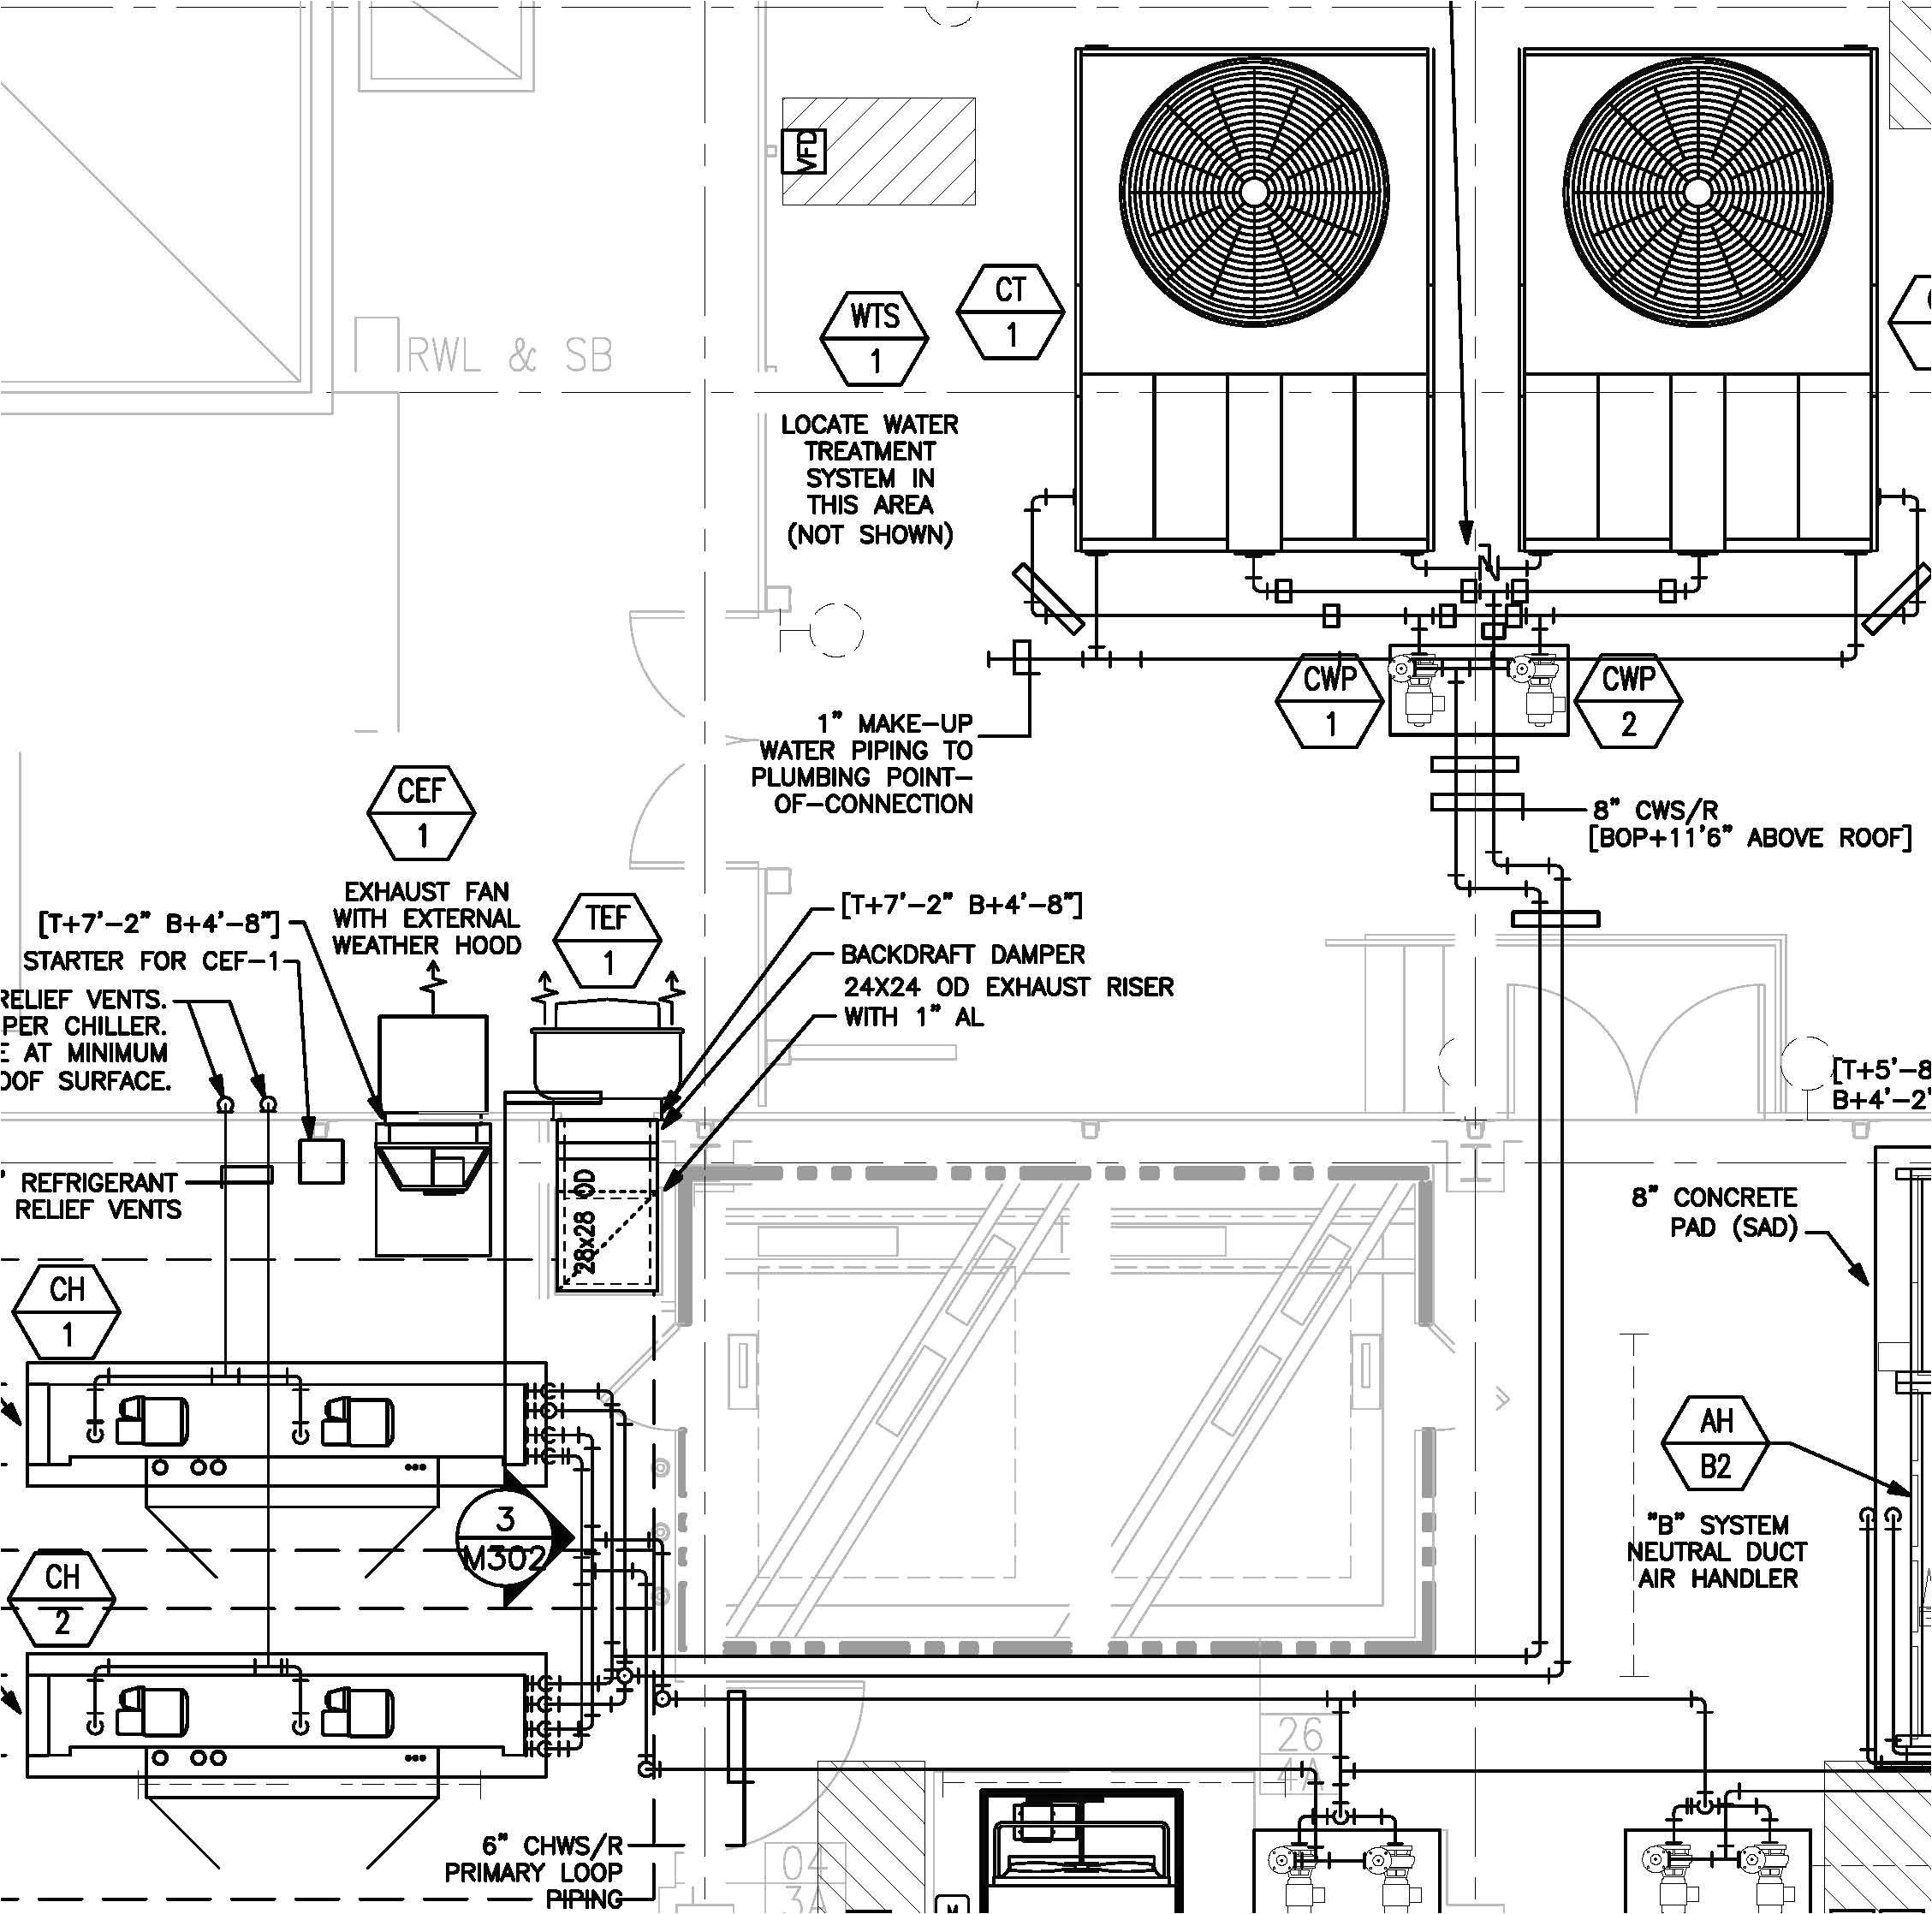 goodman ac unit wiring diagram hvac condenser wiring diagram new air conditioning condensing unit wiring diagram valid wiring diagram 11t jpg